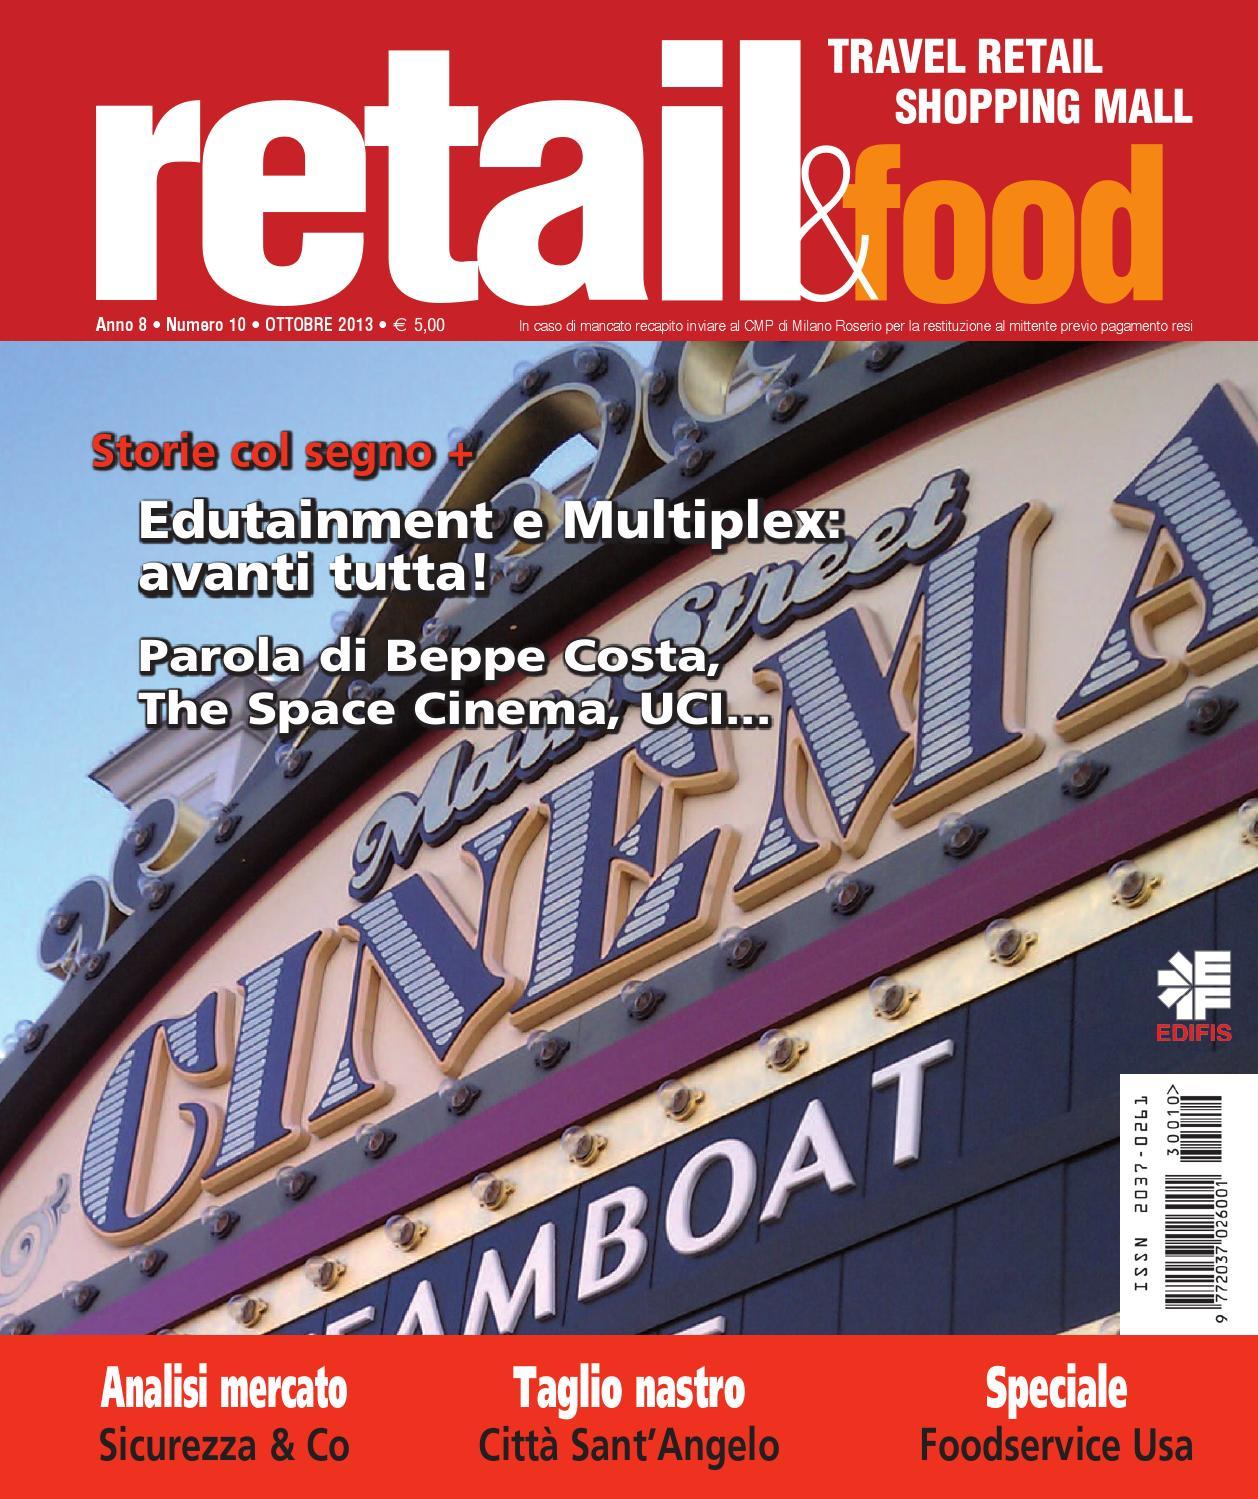 2e48955c2aa1de retail&food 2013 10 by Edifis - issuu